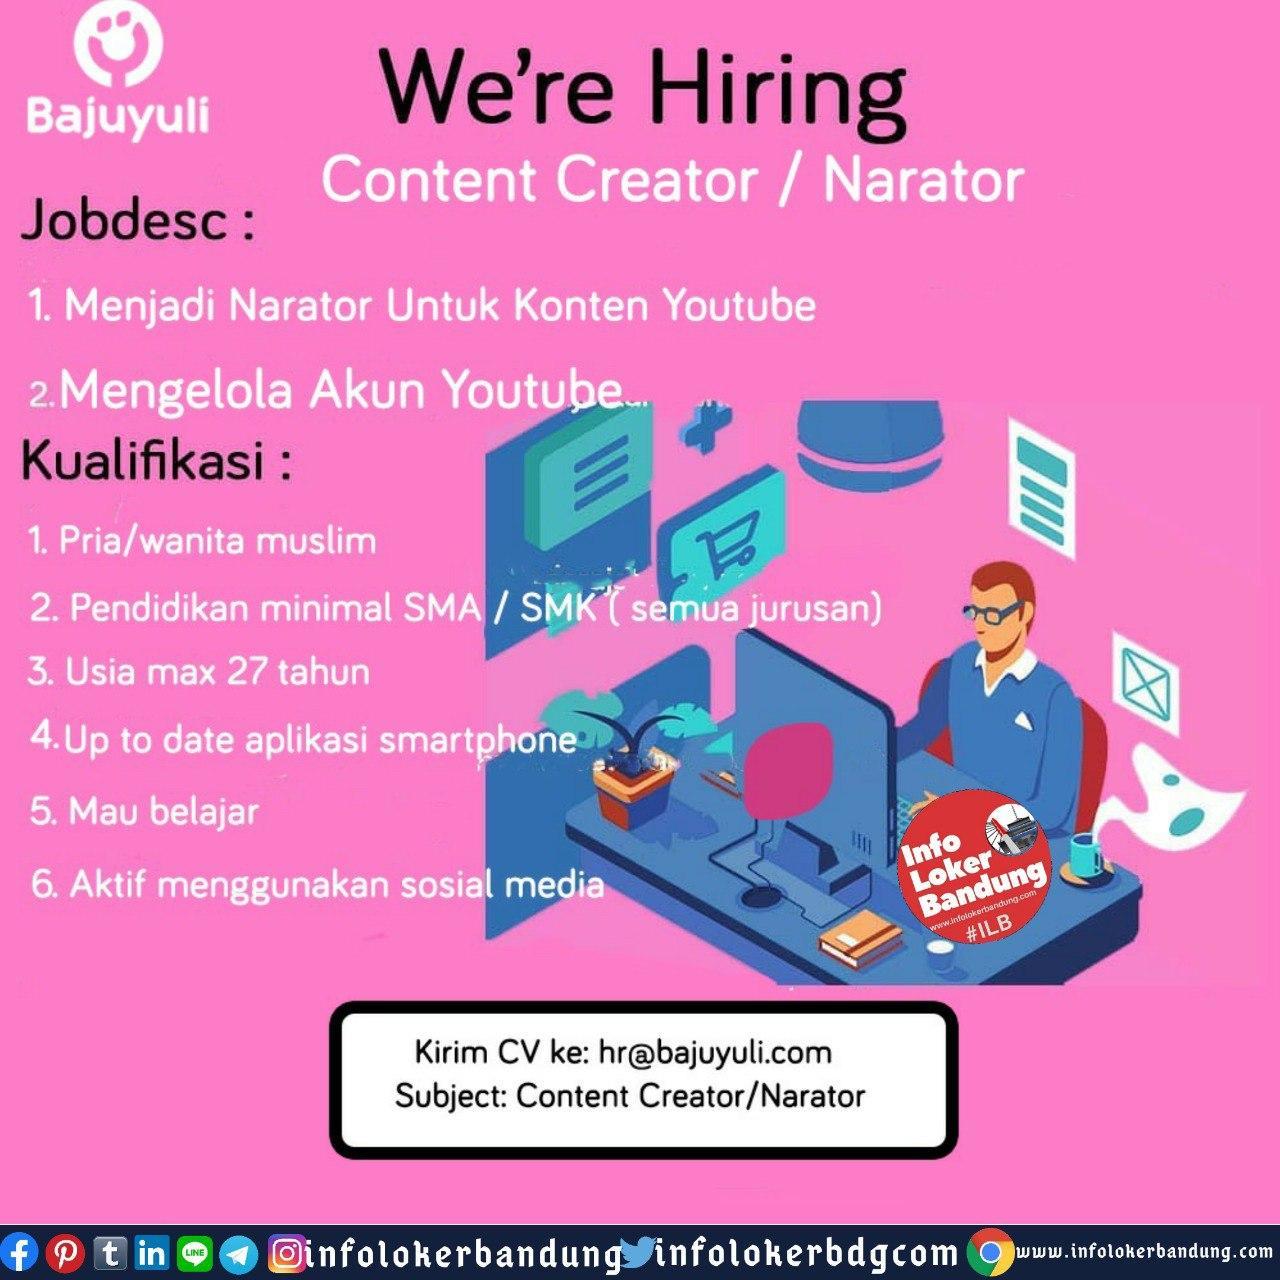 Lowongan Kerja Content Creator / Narator Bajuyuli (PT. Guna Cipta Rekayasa) Bandung Juni 2020